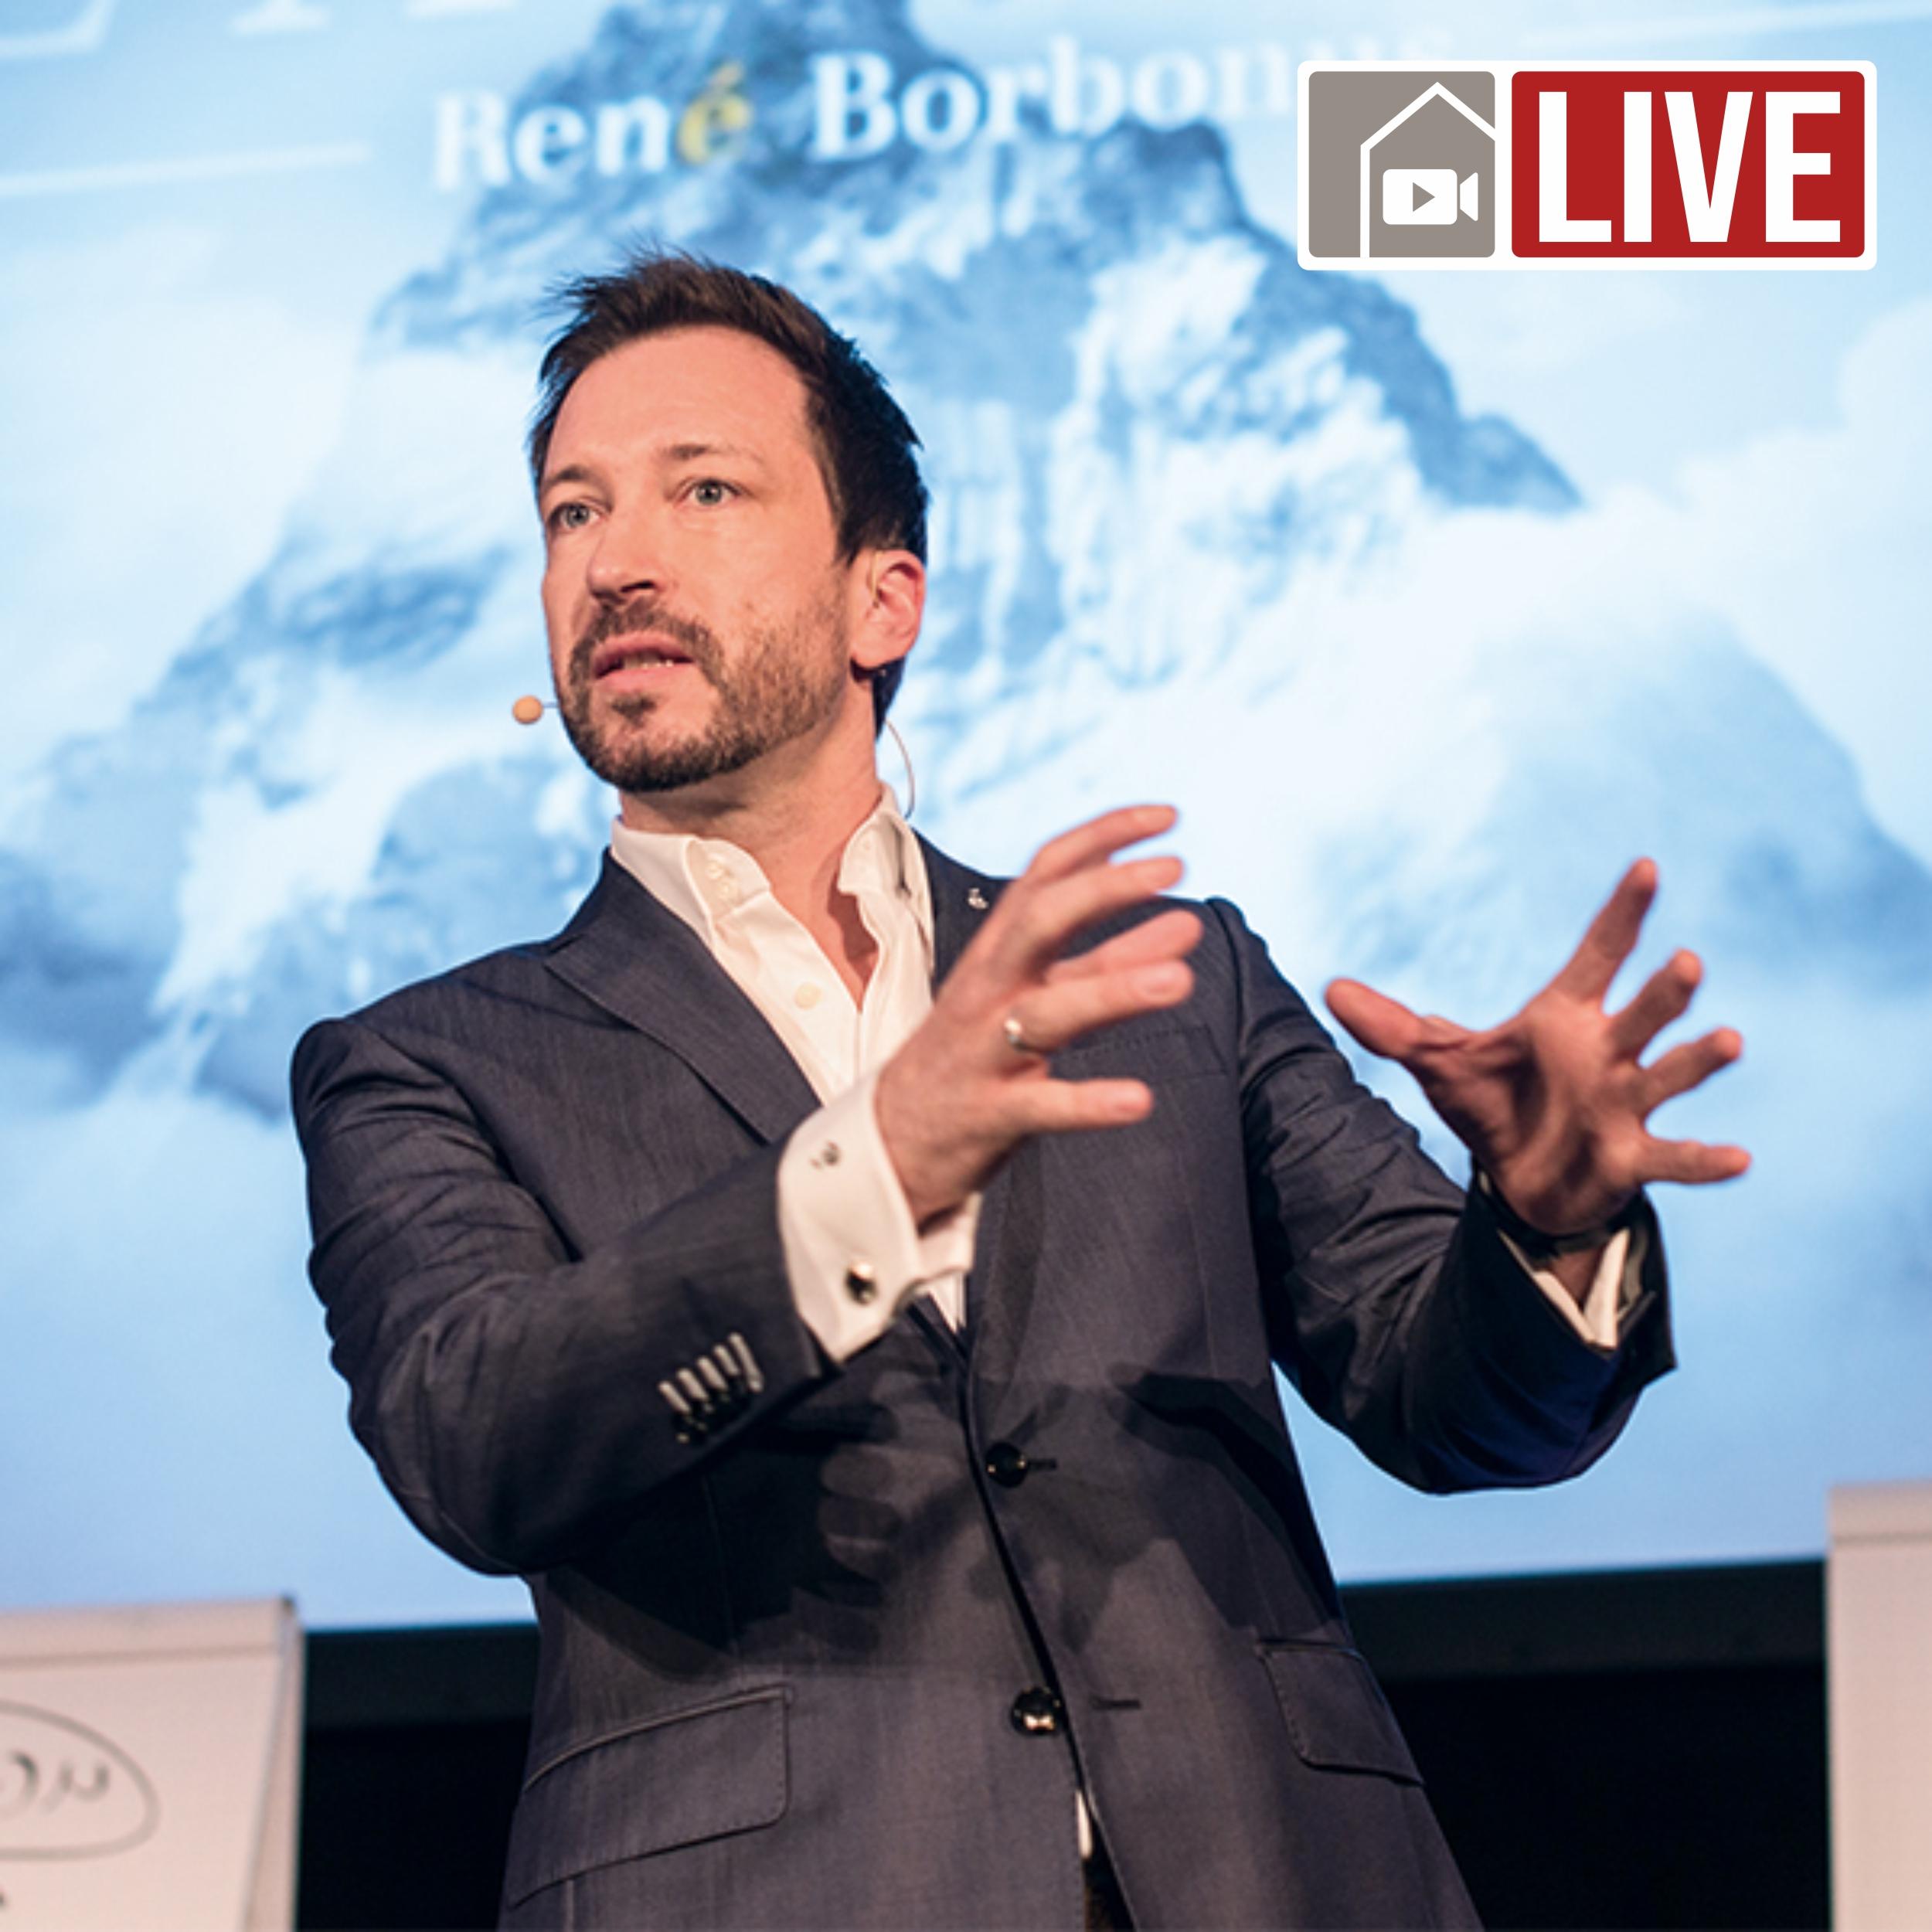 René Borbonus Livestream